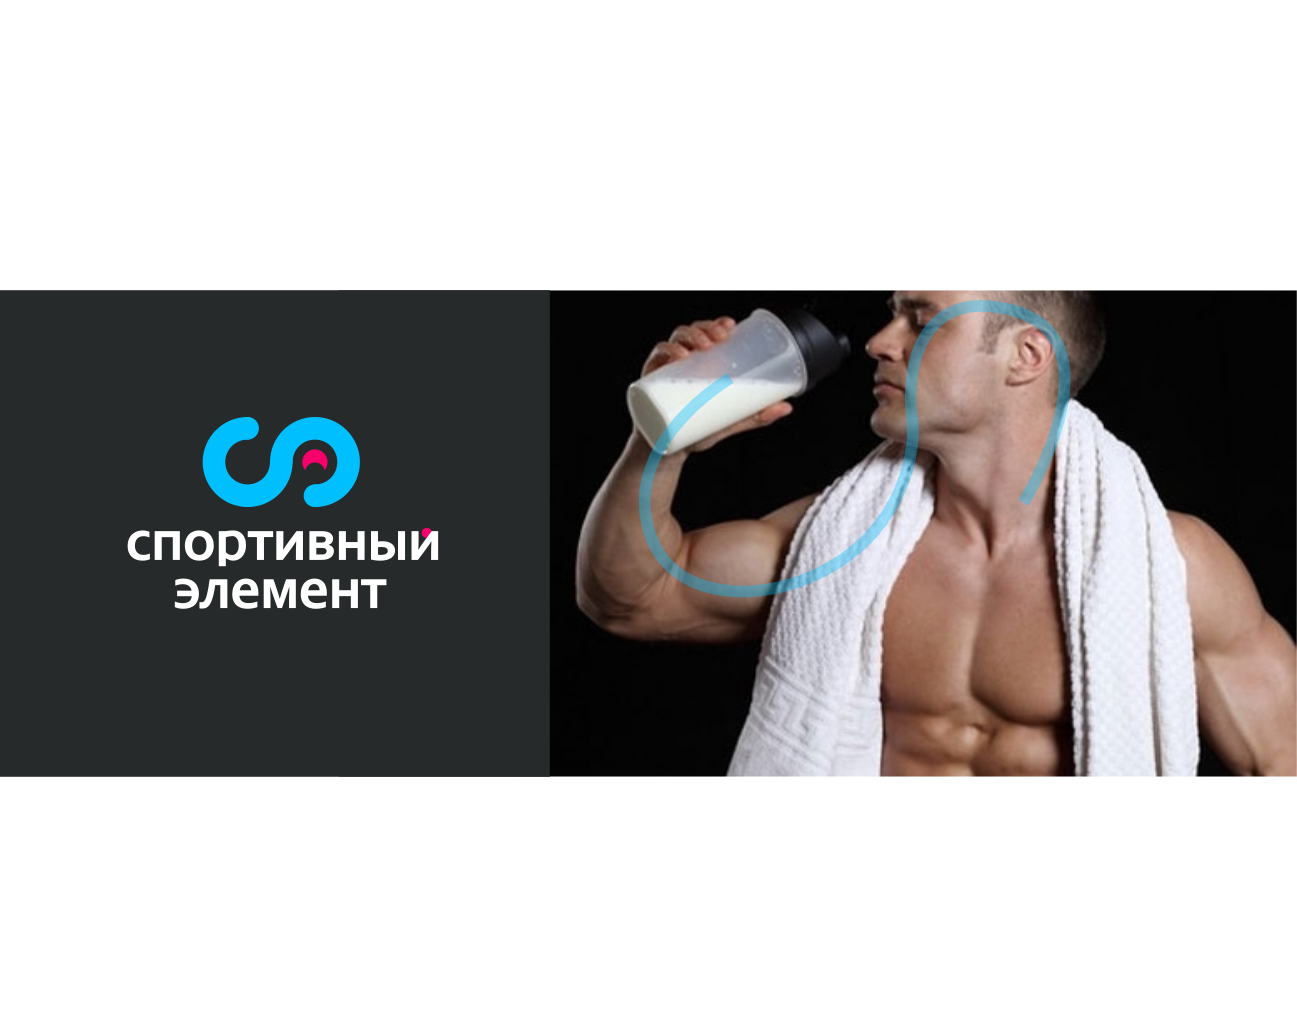 РЕДИЗАЙН ЛОГОТИПА СПОРТИВНЫХ ТОВАРОВ фото f_47059da6bbe51182.png